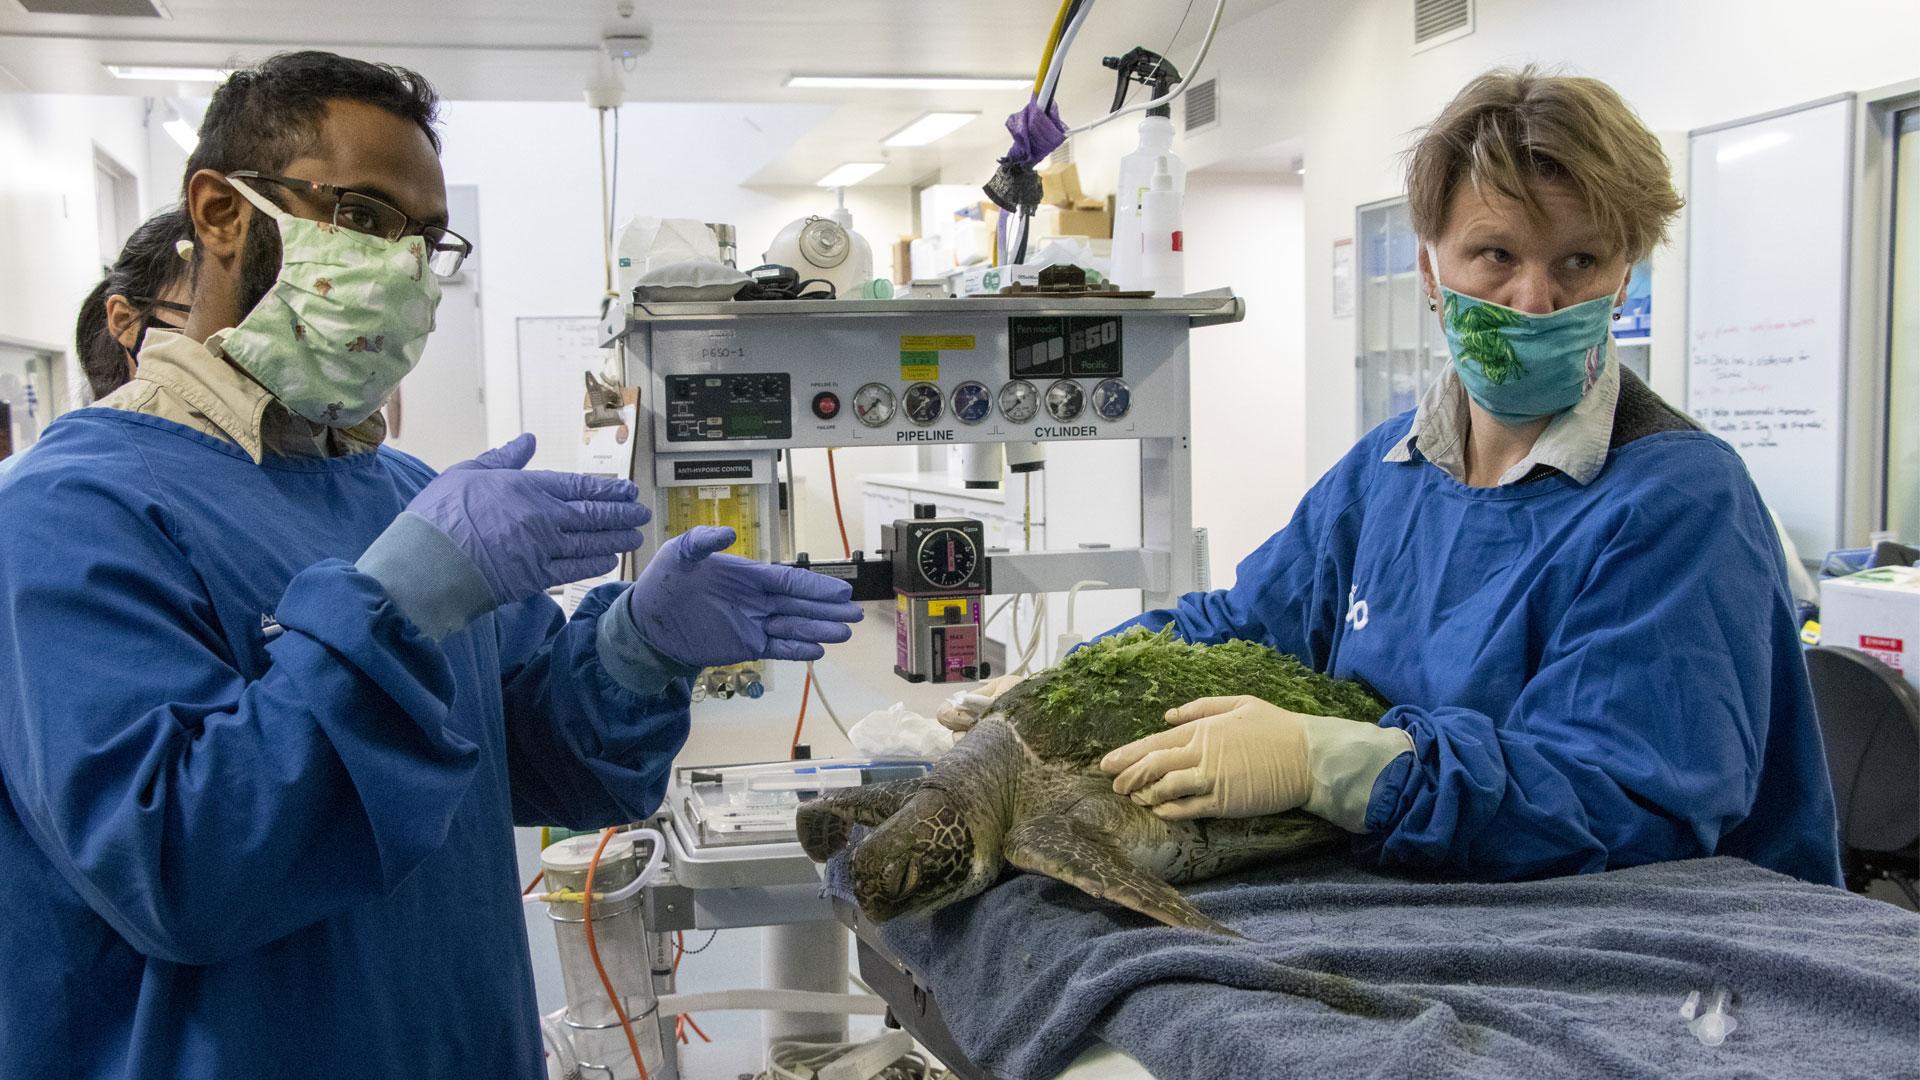 https://rfacdn.nz/zoo/assets/media/vet-hospital-turtle-stefan-gallery-1.jpg